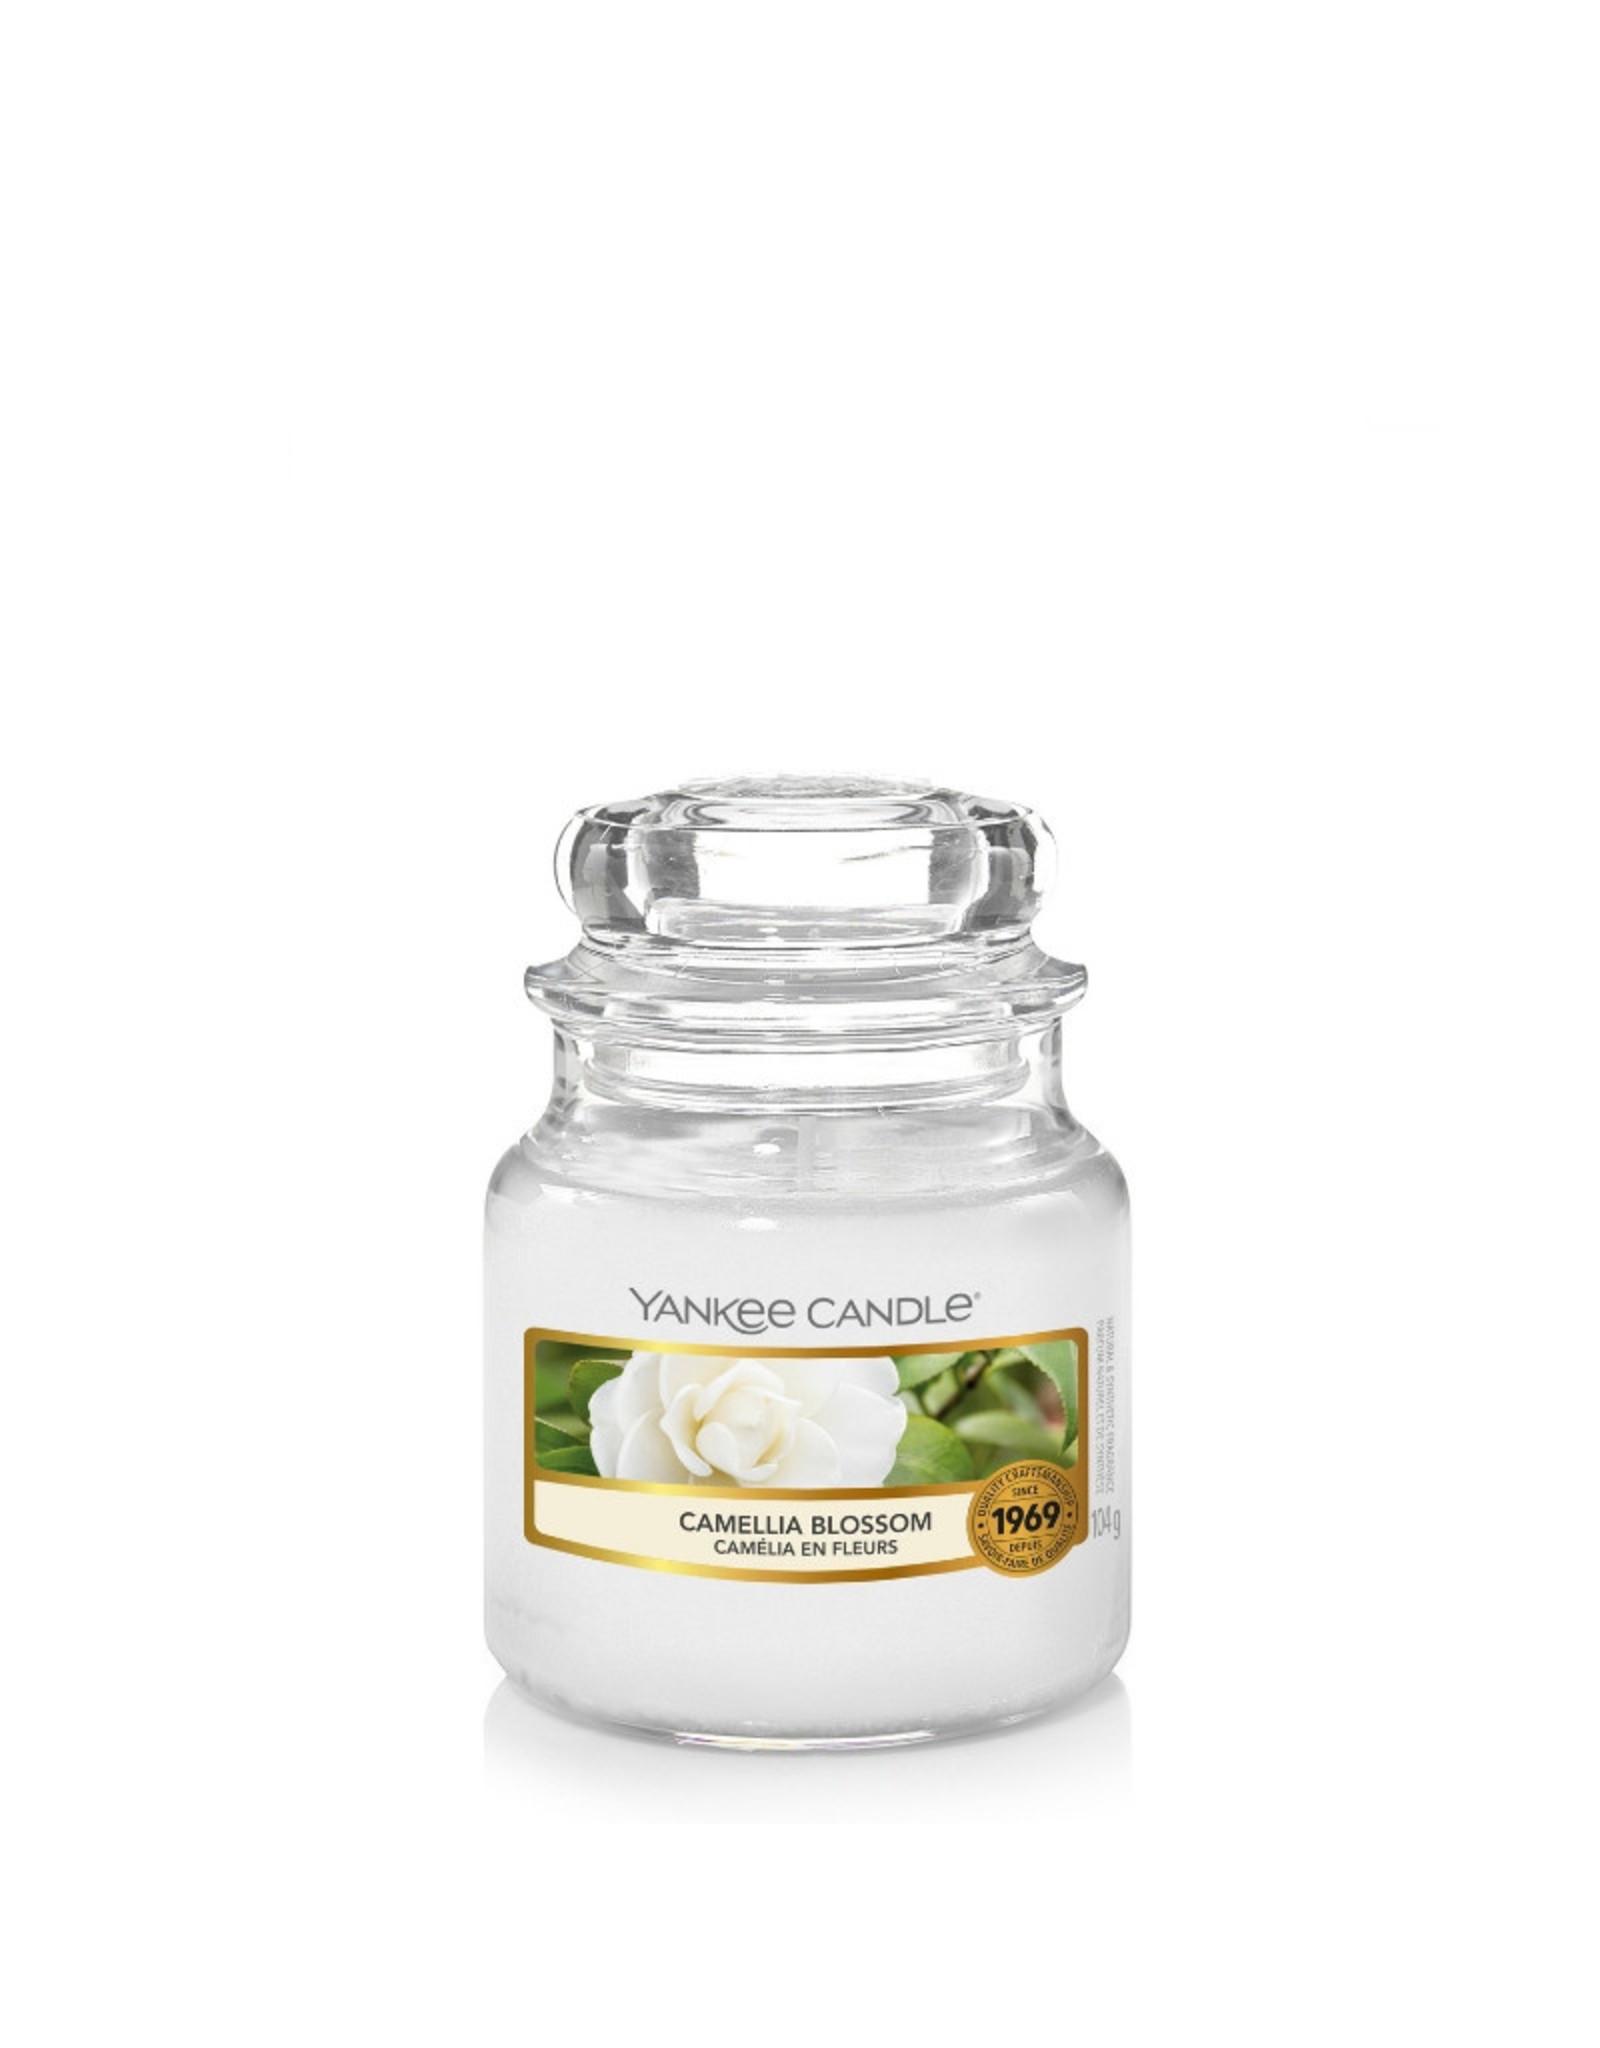 Yankee Candle Camelia Blossom - Small Jar